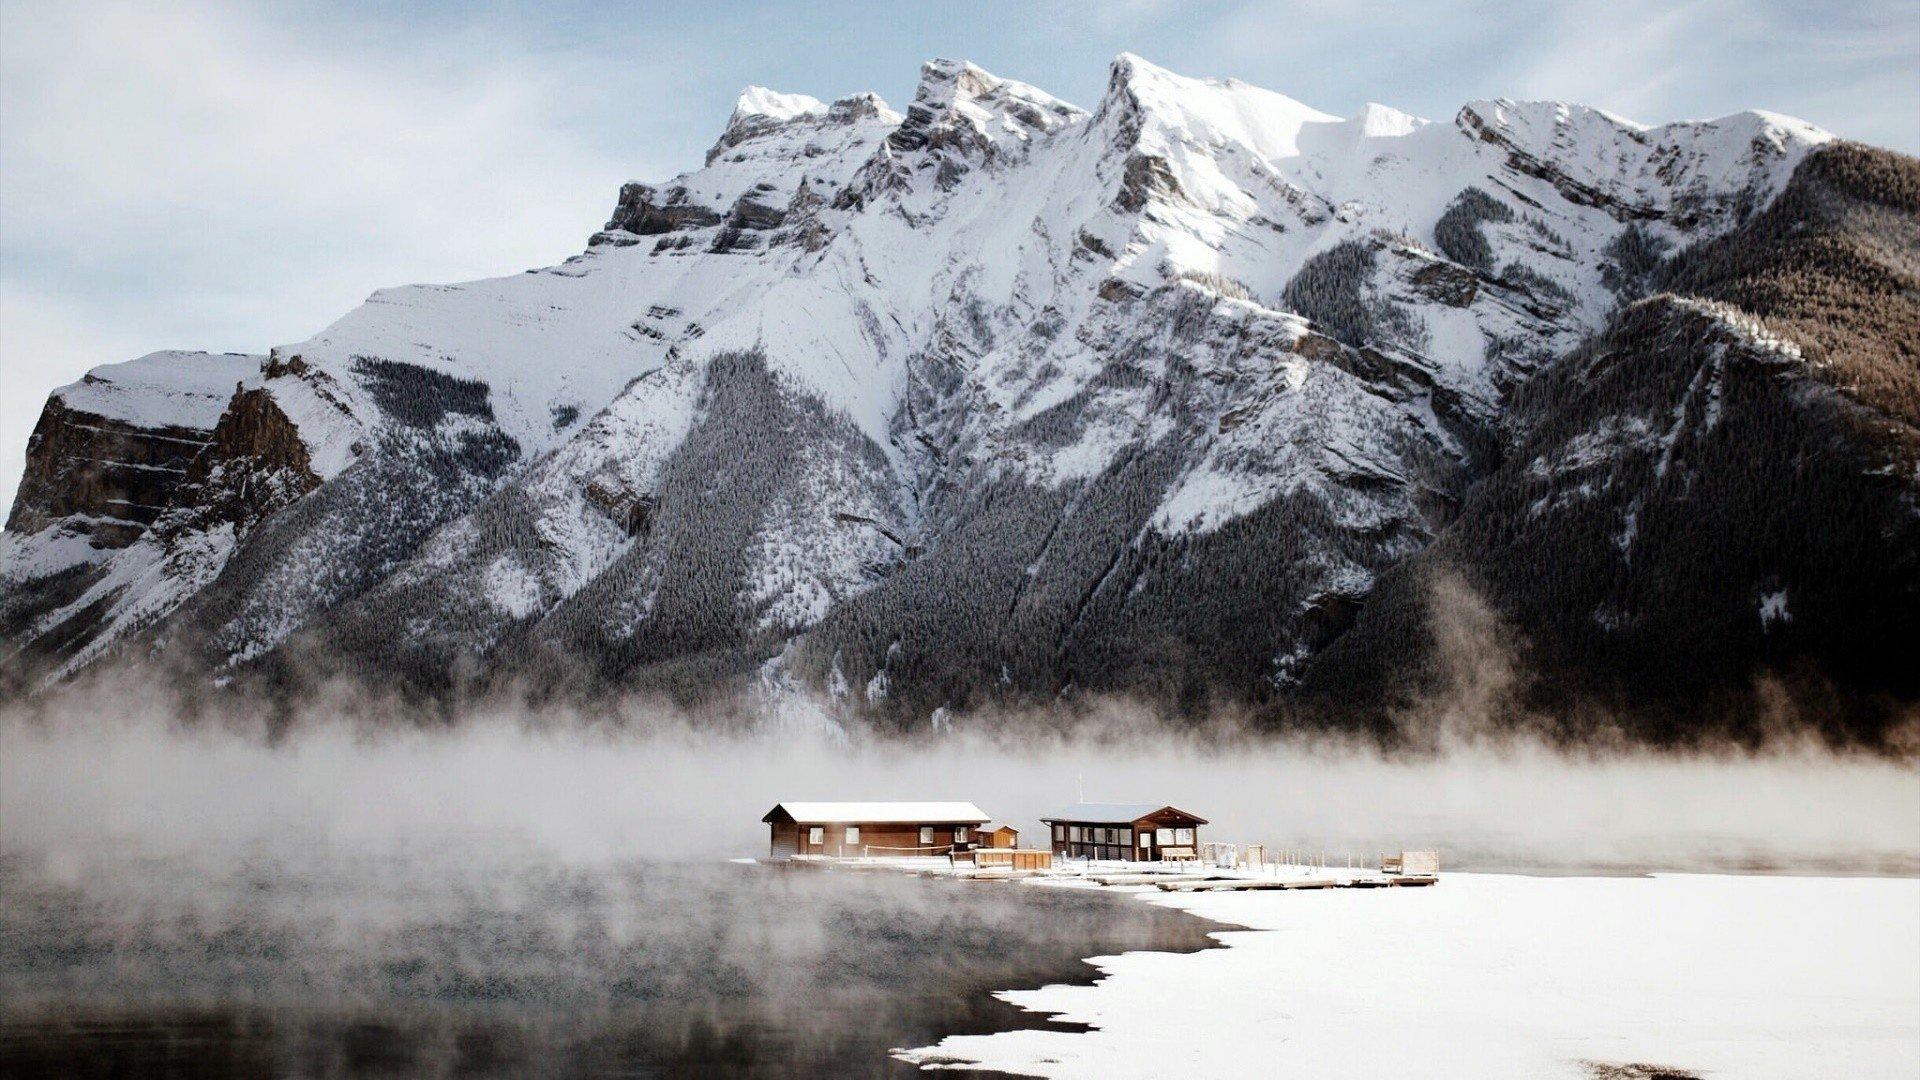 Canada Mountains Snow Winter Nature Landscape Hd